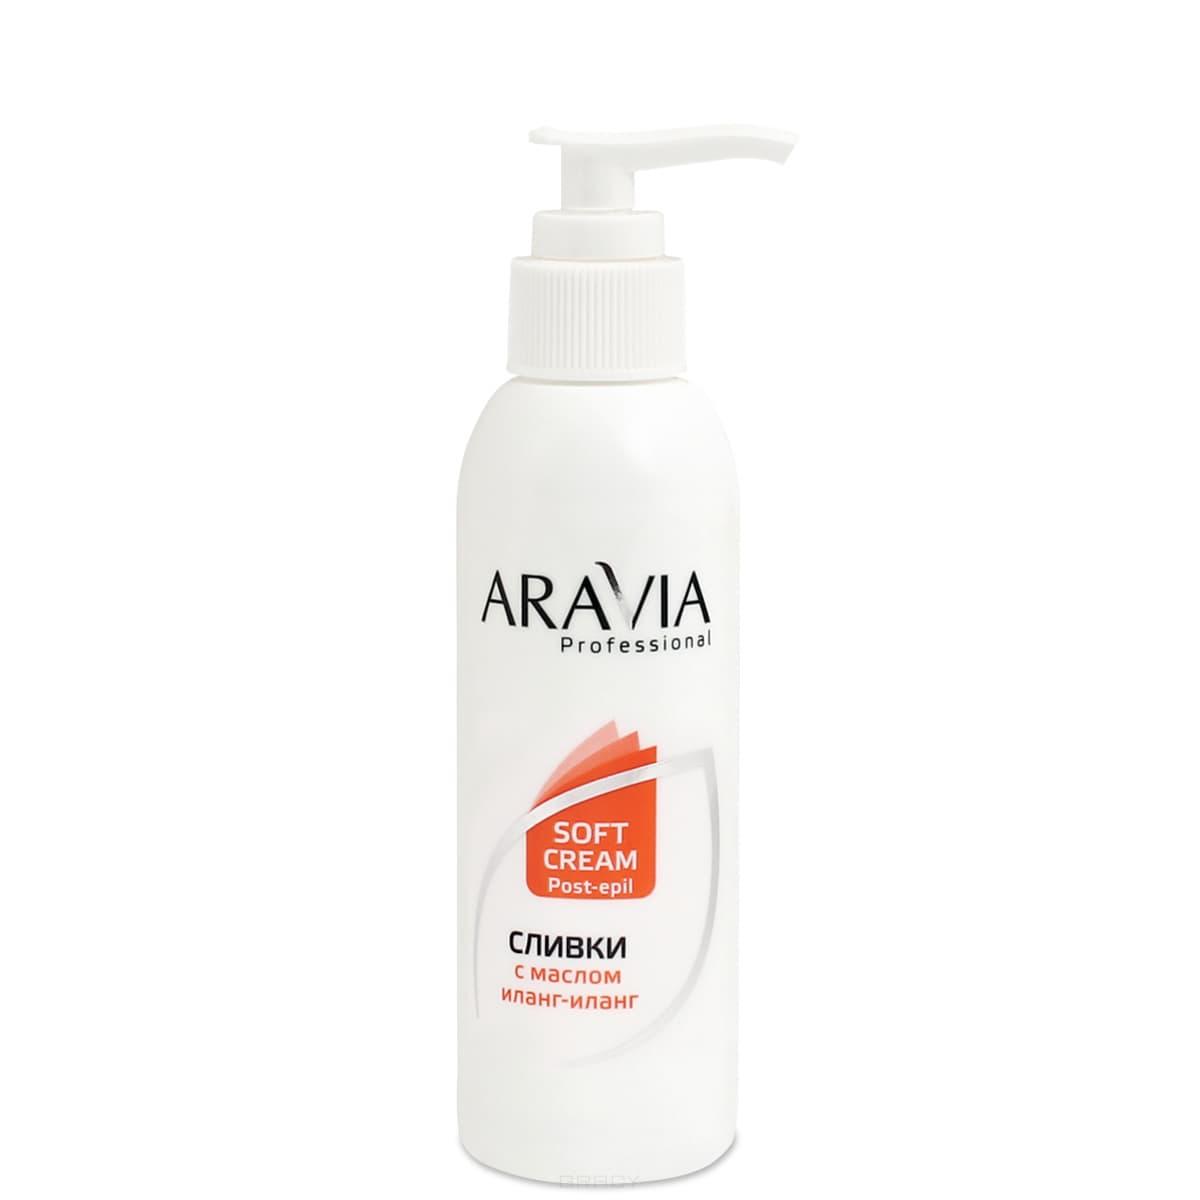 Aravia, Сливки для восстановления рН кожи с маслом иланг-иланг (флакон с дозатором), 150 мл aravia сливки для восстановления рн кожи с маслом иланг иланг 150 мл